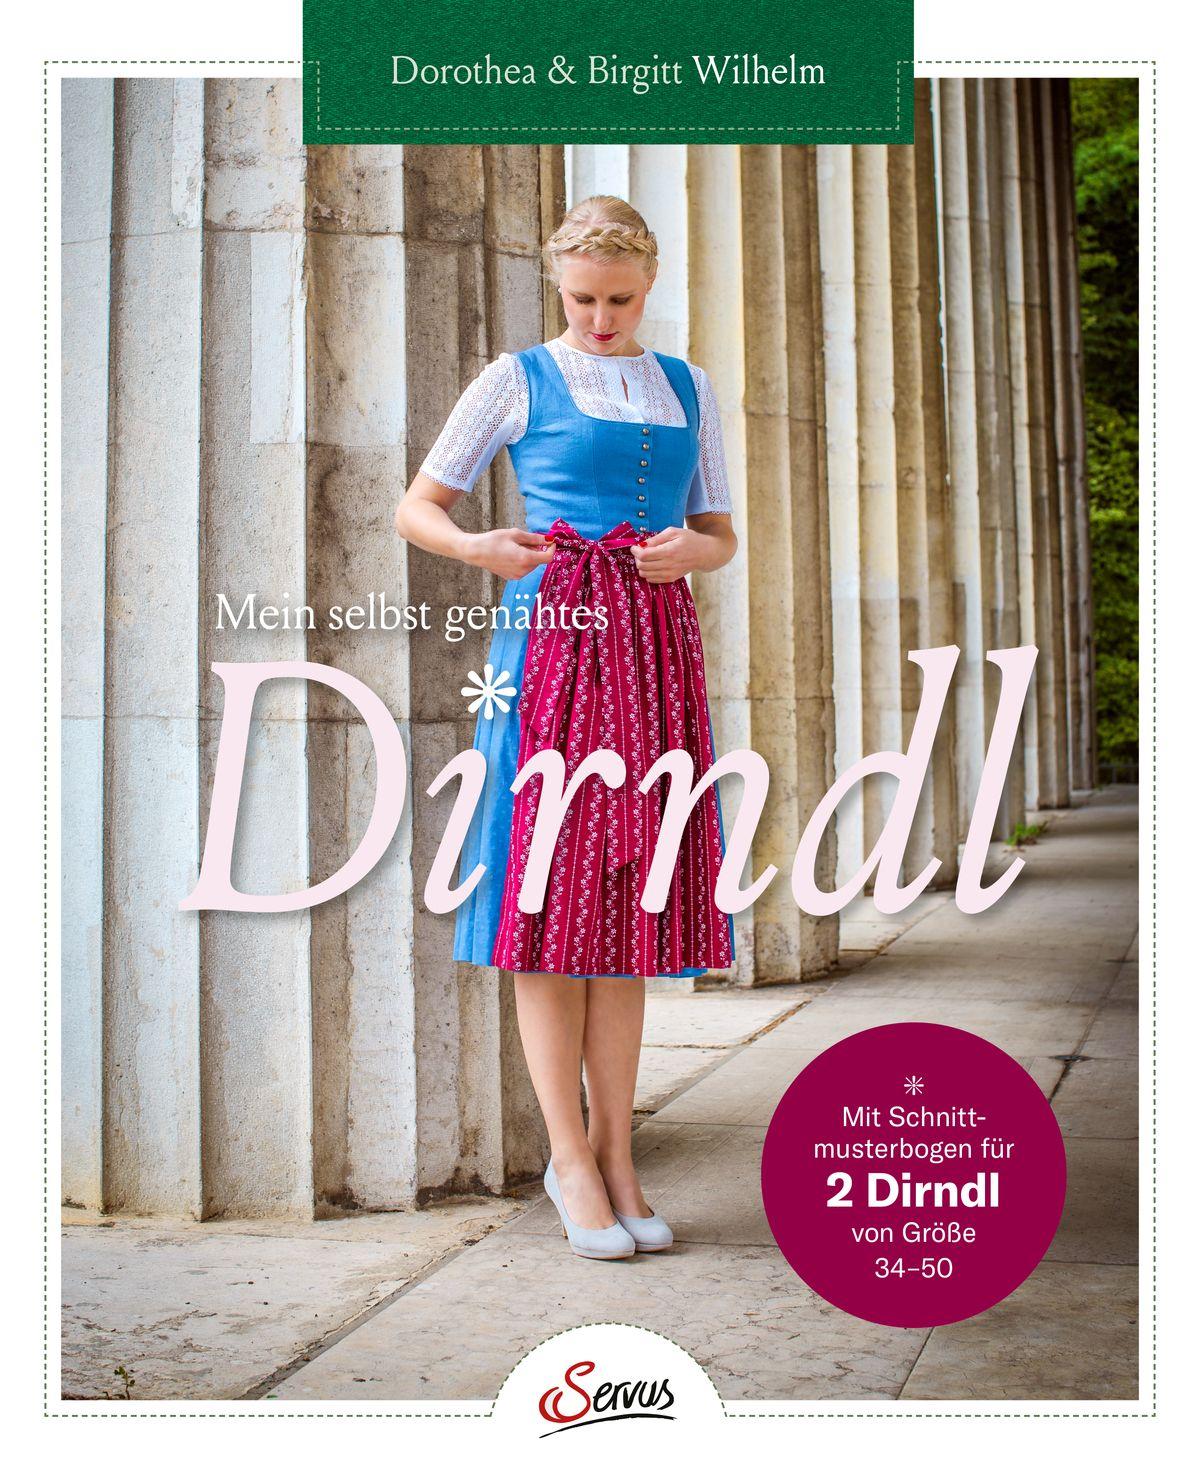 """Mein selbst genähtes Dirndl"" Dorothea & Birgitt Wilhelm Servus ISBN-13 9783710402197"